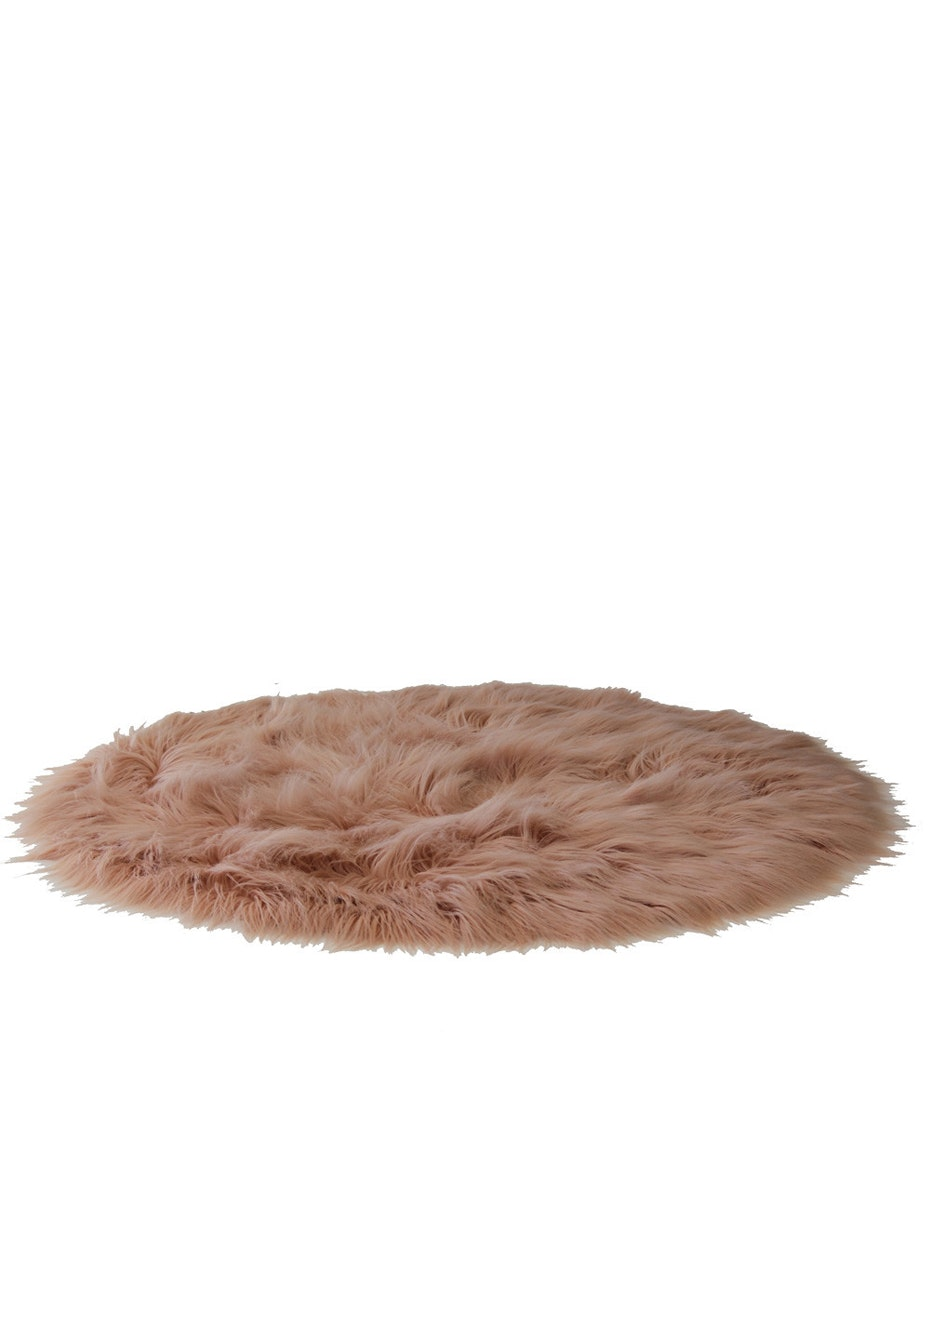 Me & My Trend - Blush Sheep Rug/Throw